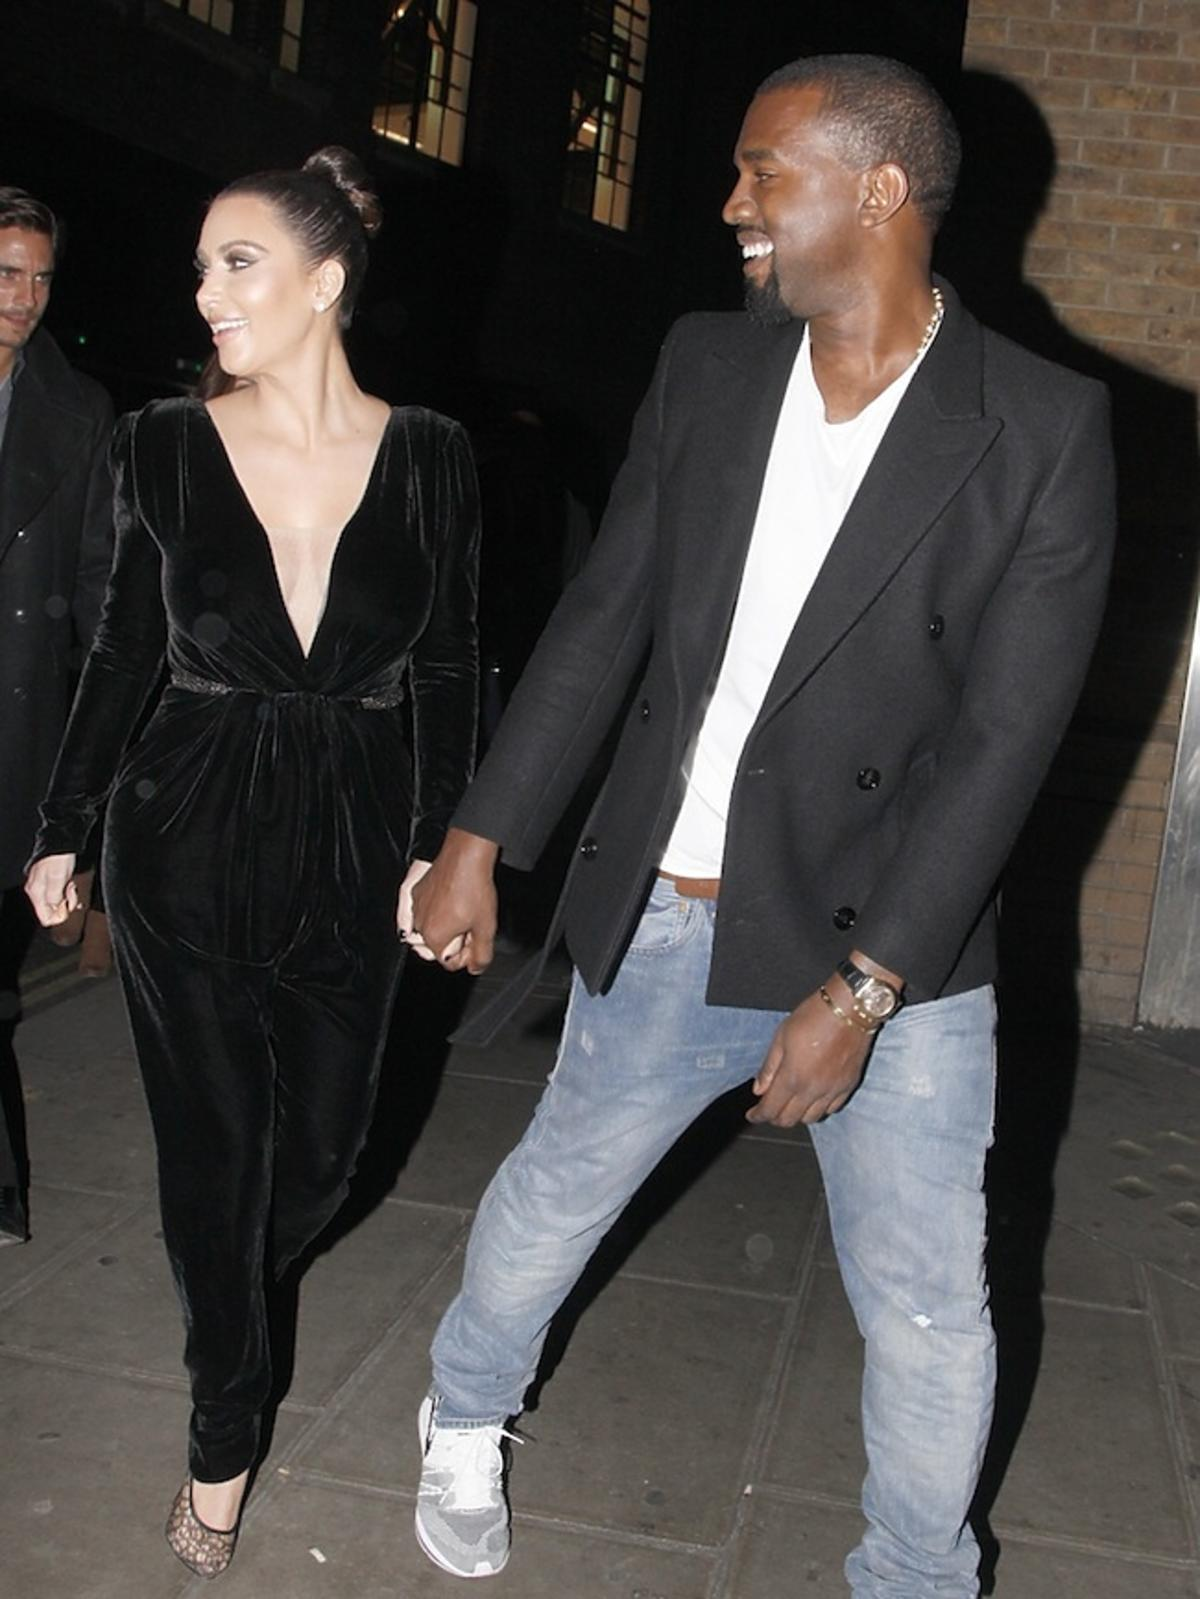 All-ONS_1453480-Kim_Kardashian_Kanye_West.jpg